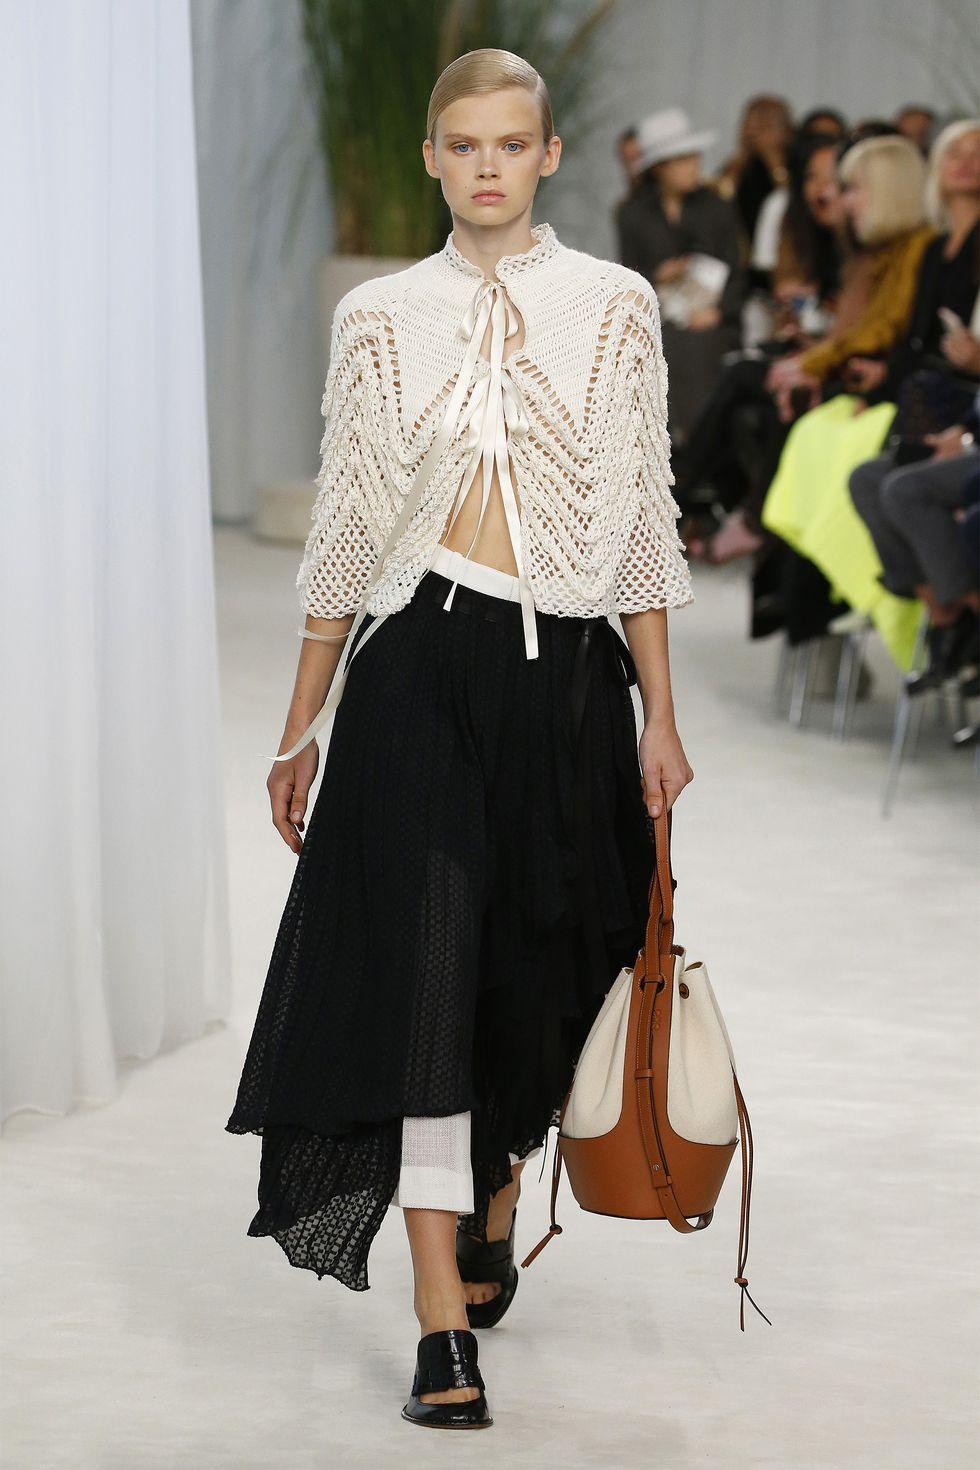 10 Looks Harper S Bazaar Editors Loved From Fashion Month Fashion Fashion Week Trends Fashion Week